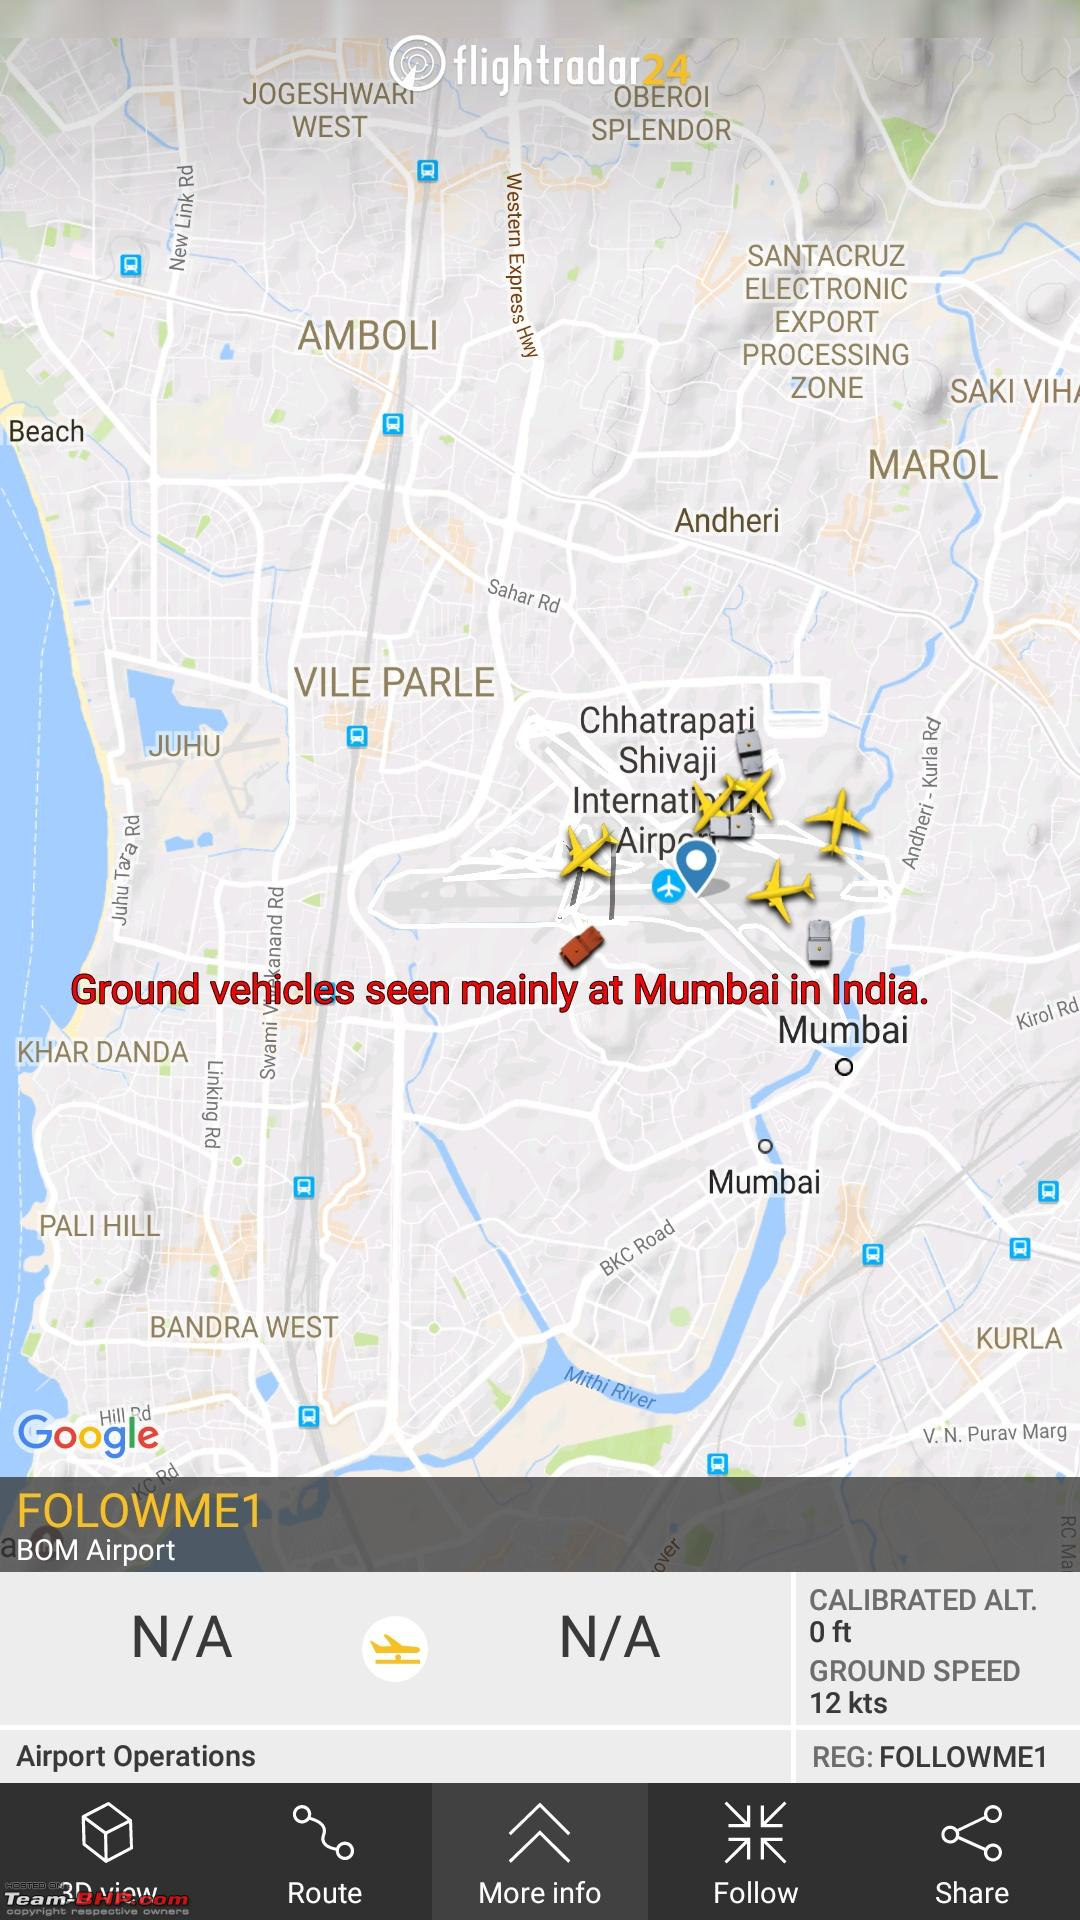 FlightRadar24 - Live Flight Tracker  My experience as a host